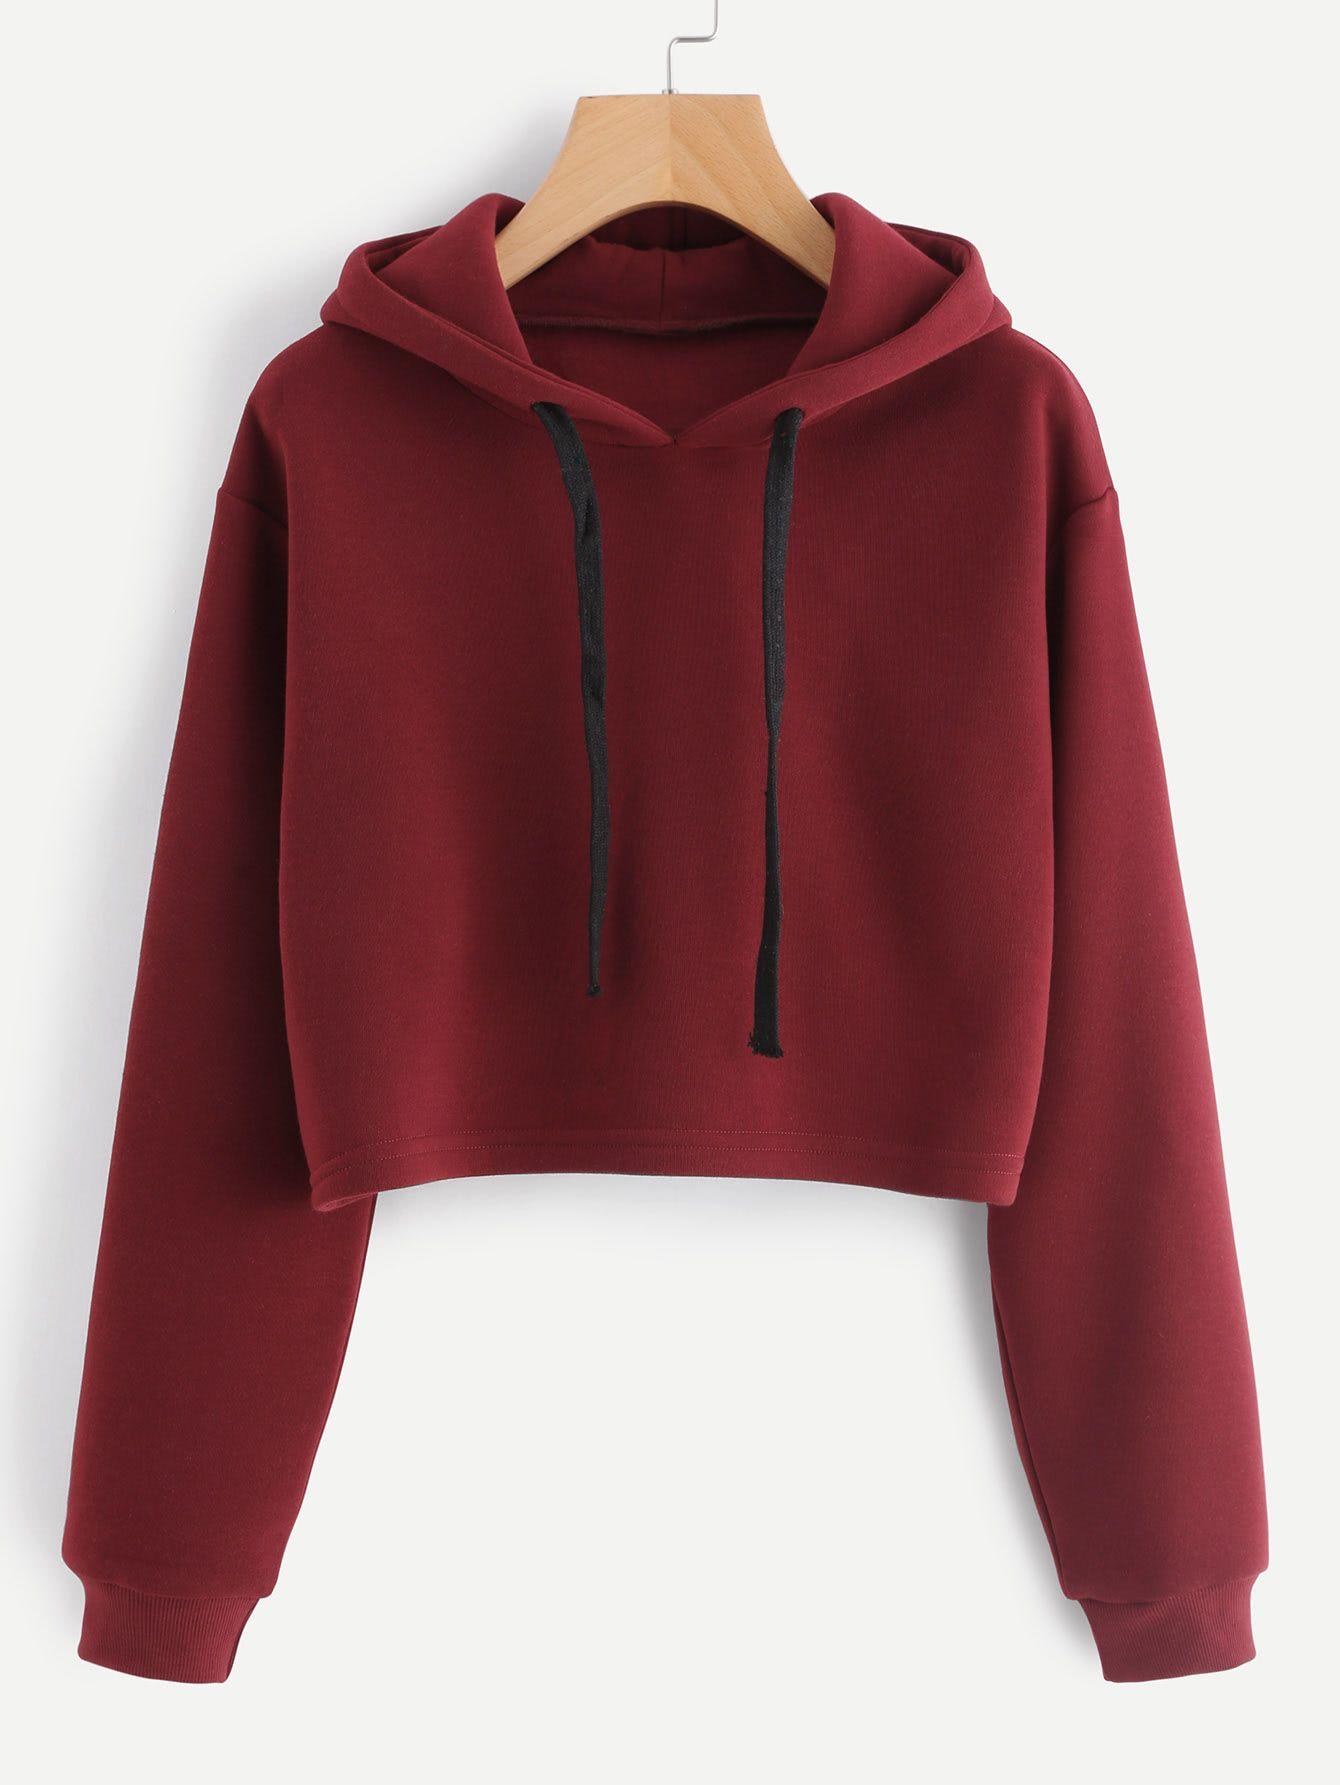 timeless design 2b55a 7543e Shop Hooded Drawstring Cashmere Sweatshirt online. SheIn ...